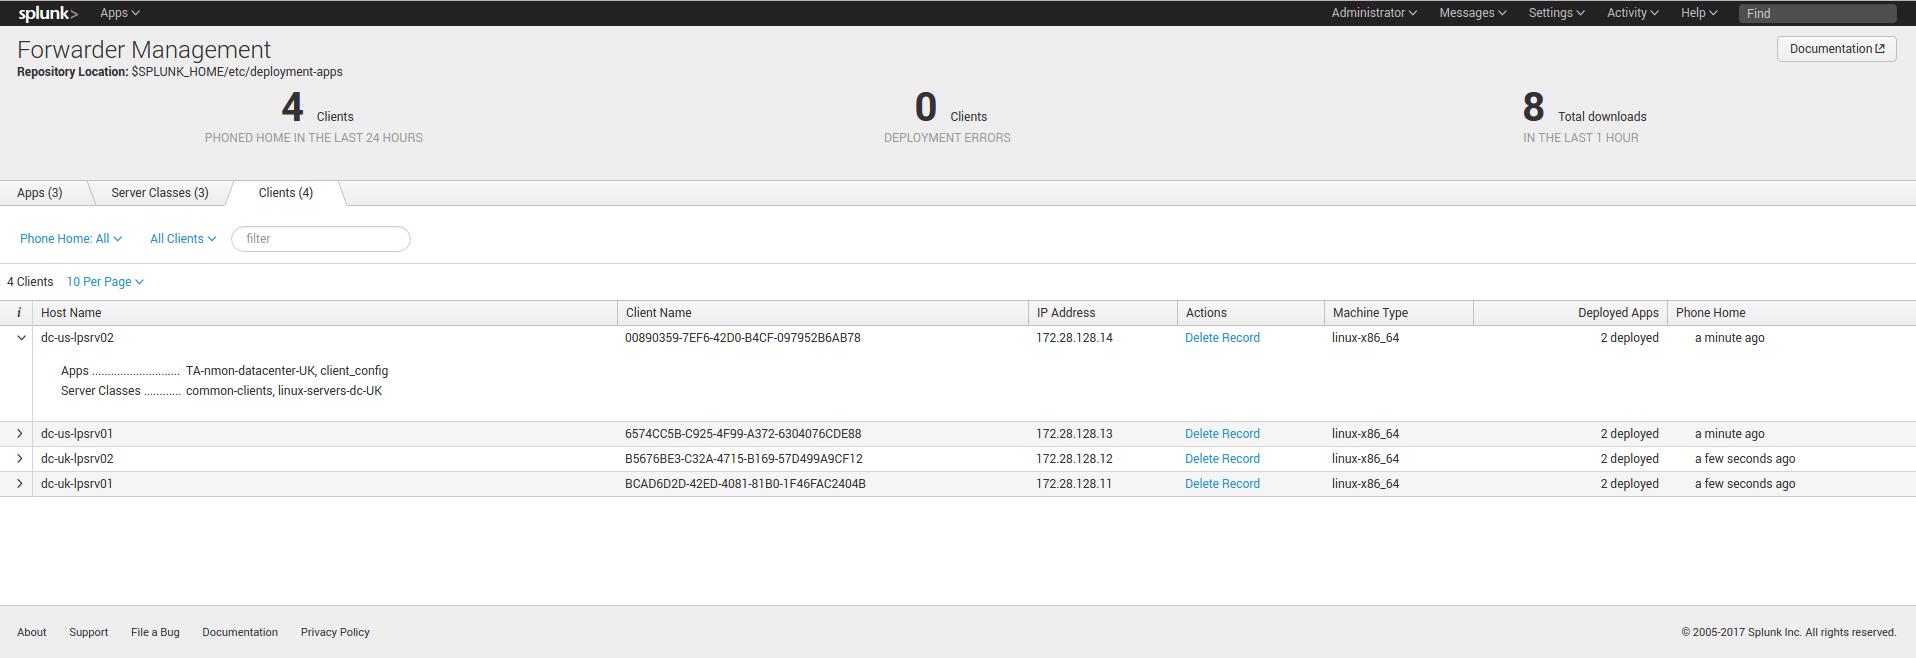 Userguide — Nmon Performance monitor Splunk app for Unix